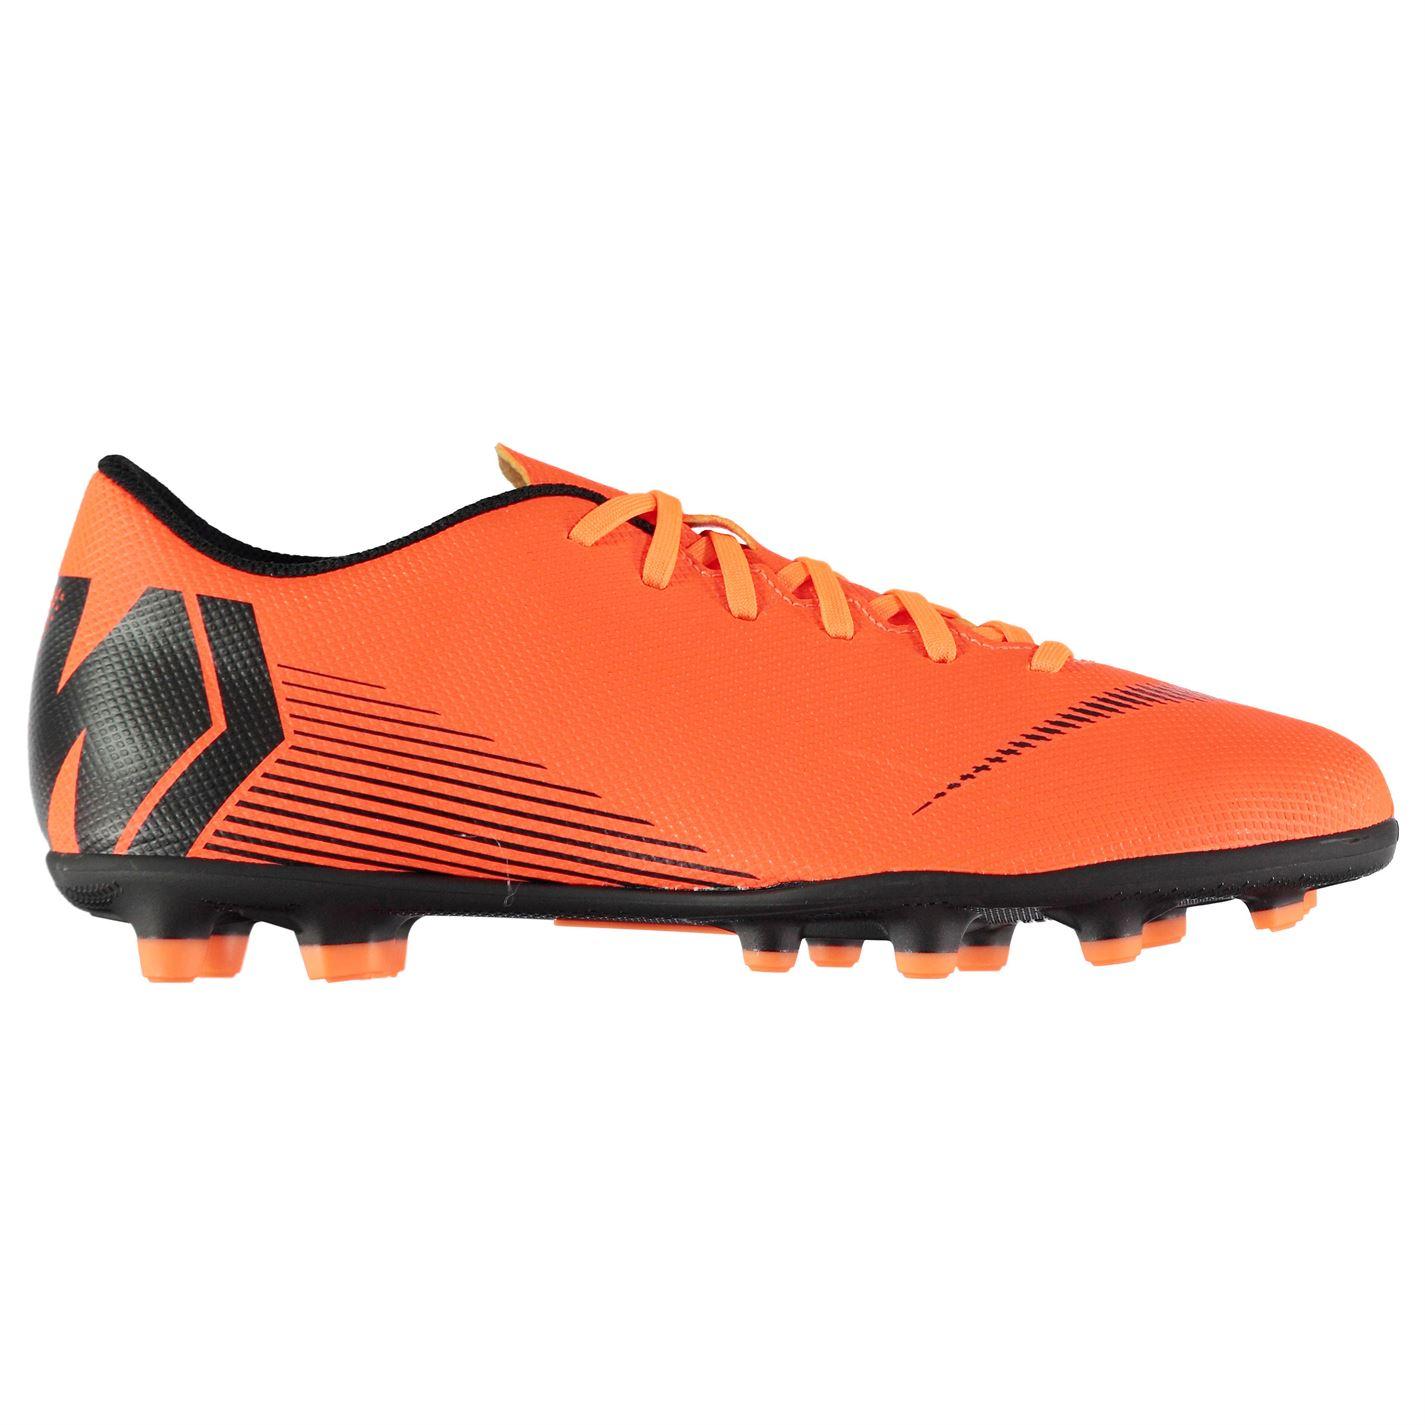 c79d0c46b Fotbalové kopačky Nike Mercurial Vapor Club Mens FG Football Boots ...